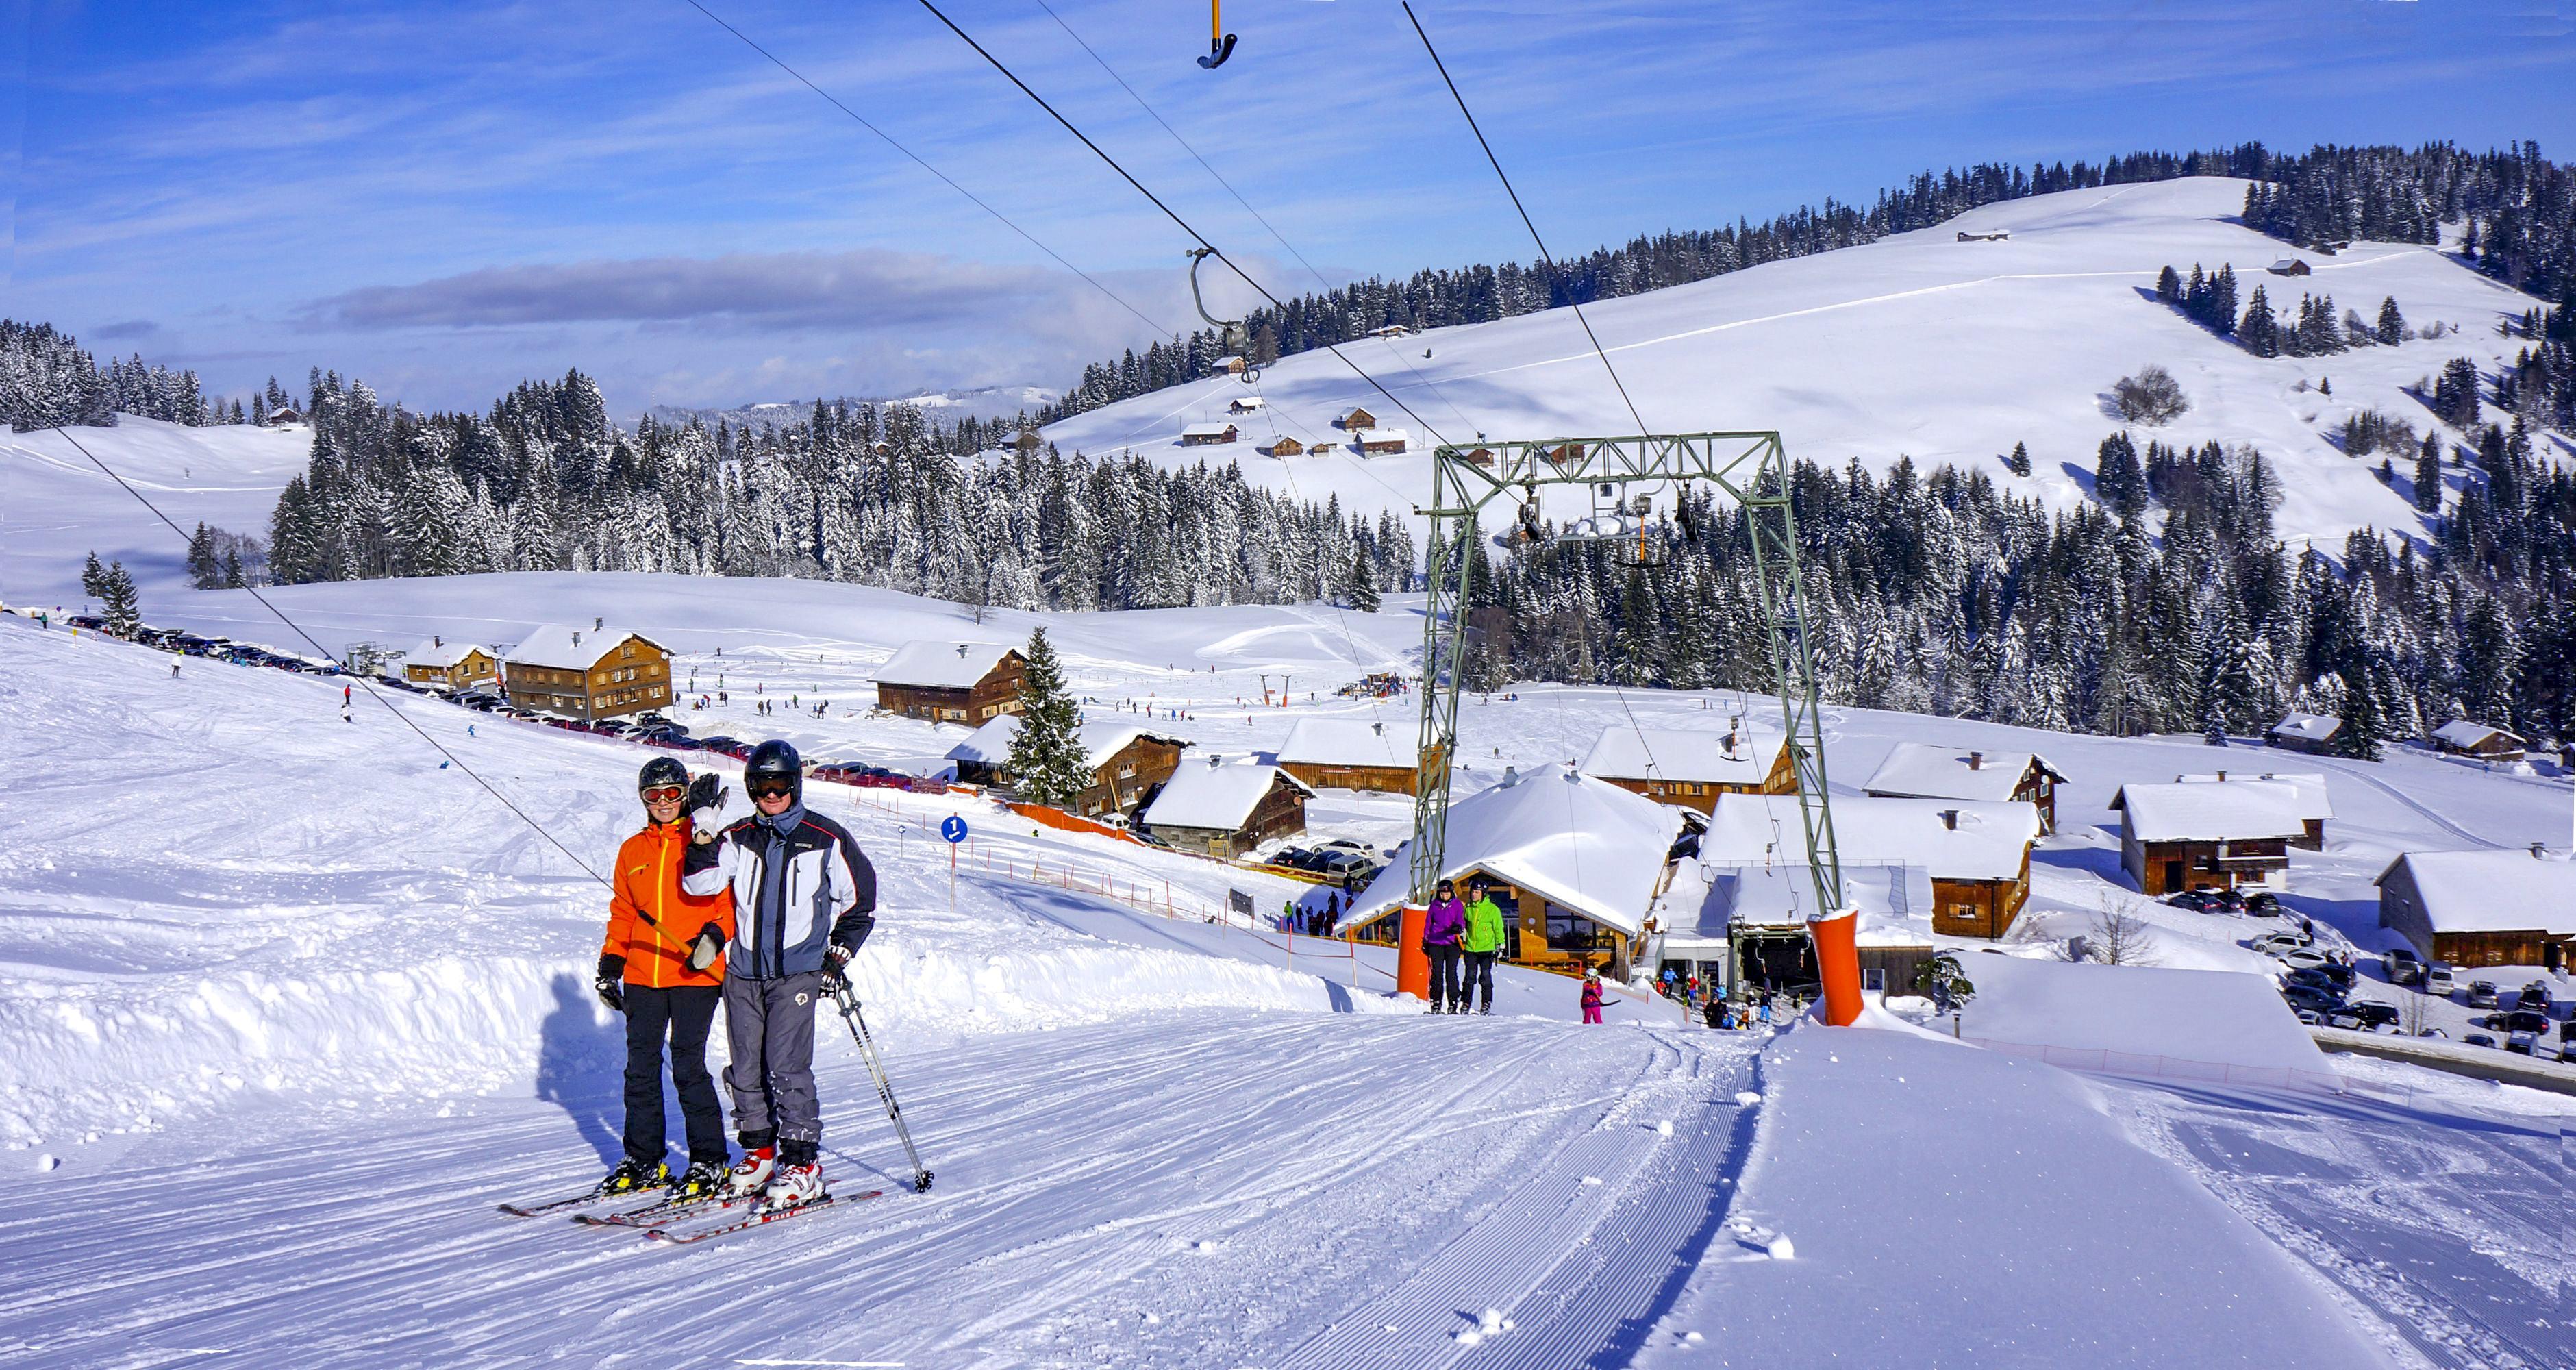 Skigebiet Bödele, Hochälpelelift / Copyright© Alois Metzler